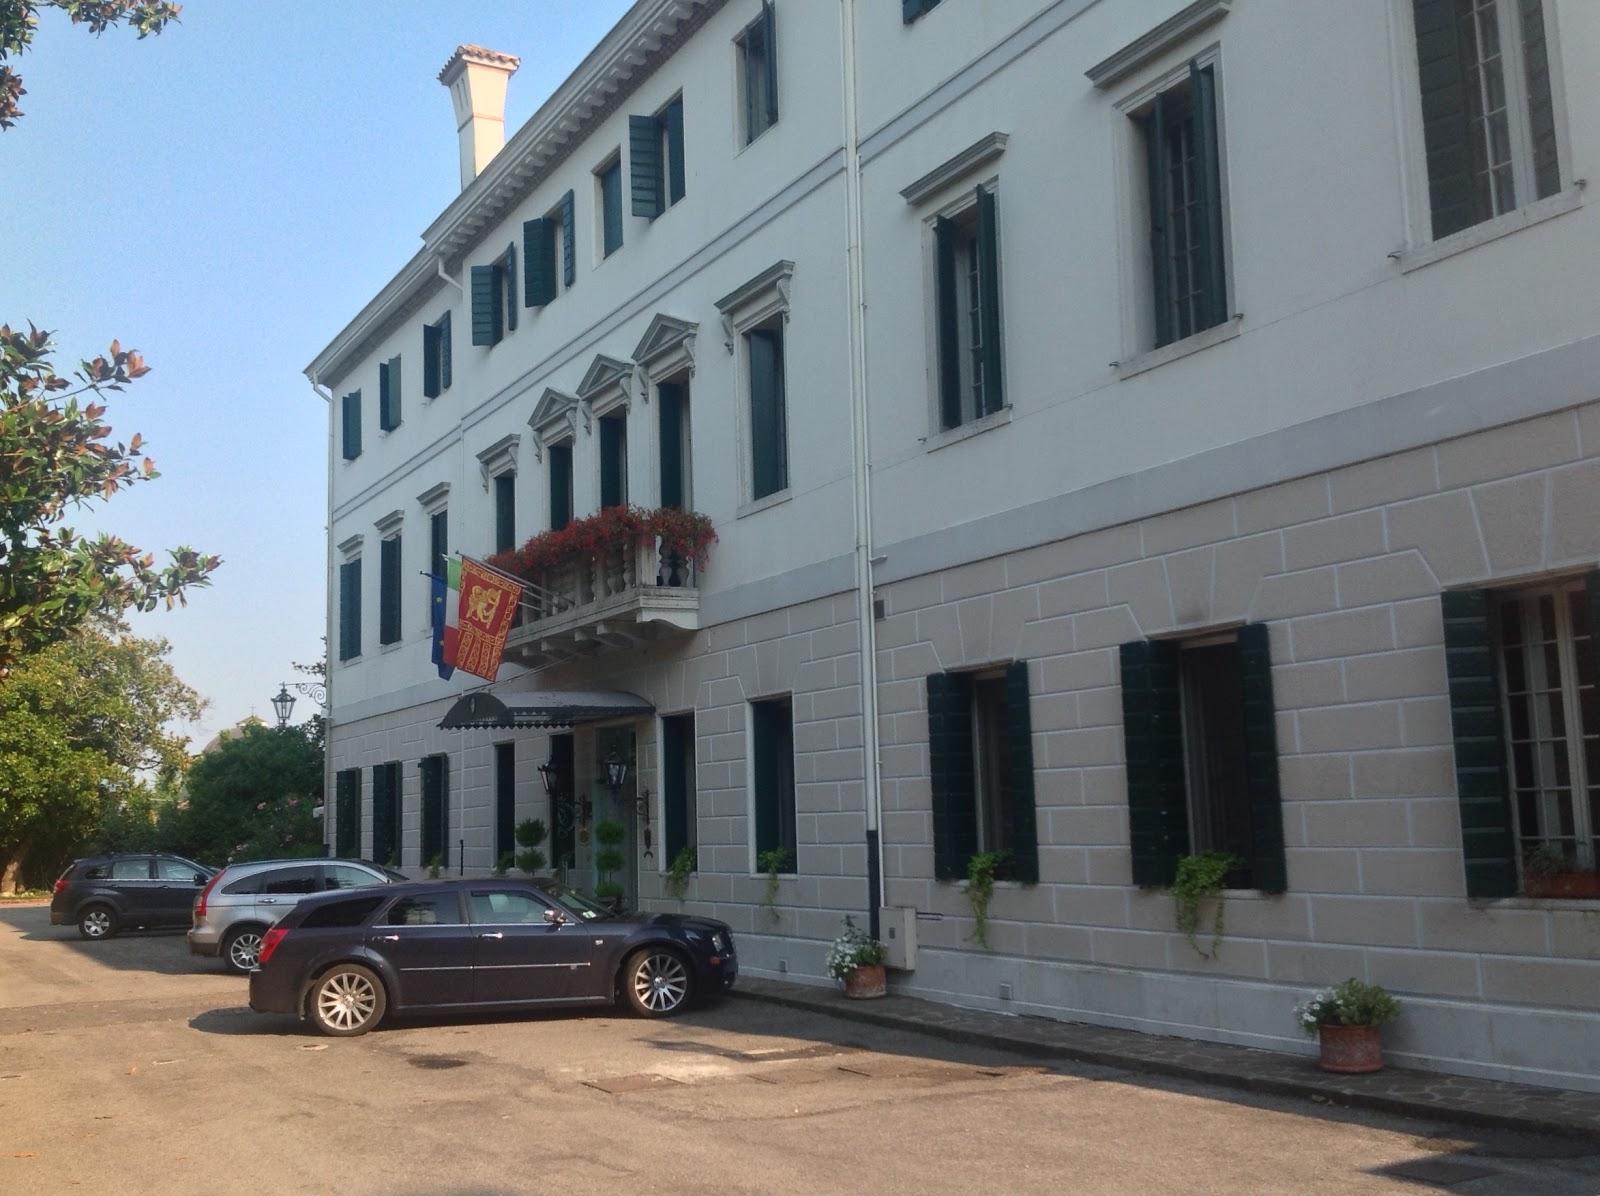 Villa Revedin Ristorante